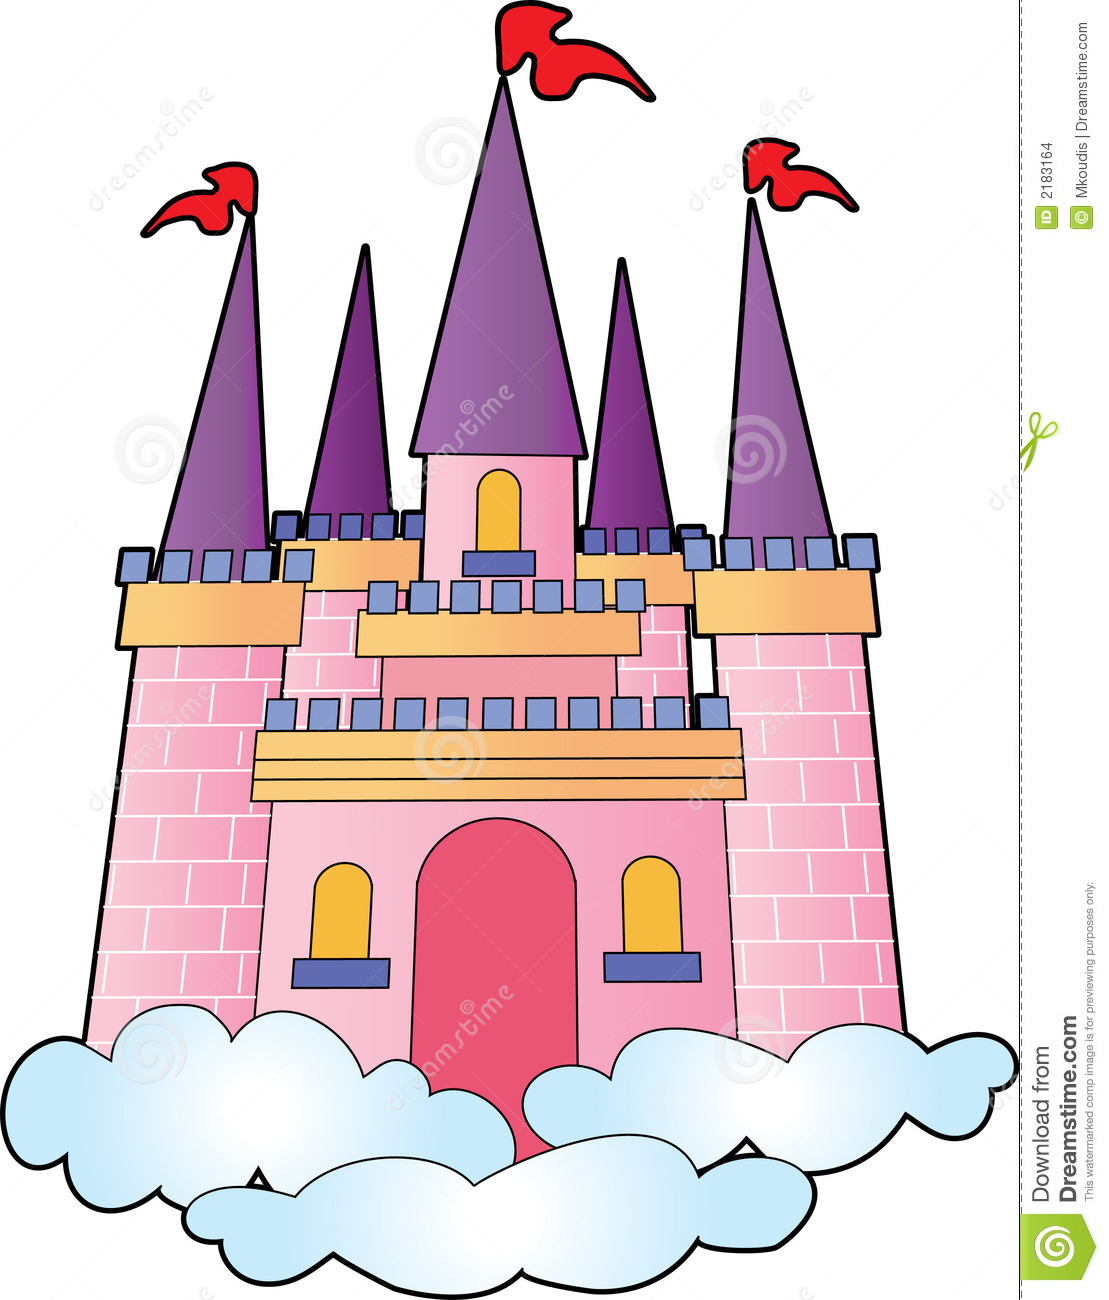 Castle Clip Art u0026middot; dragon clipart